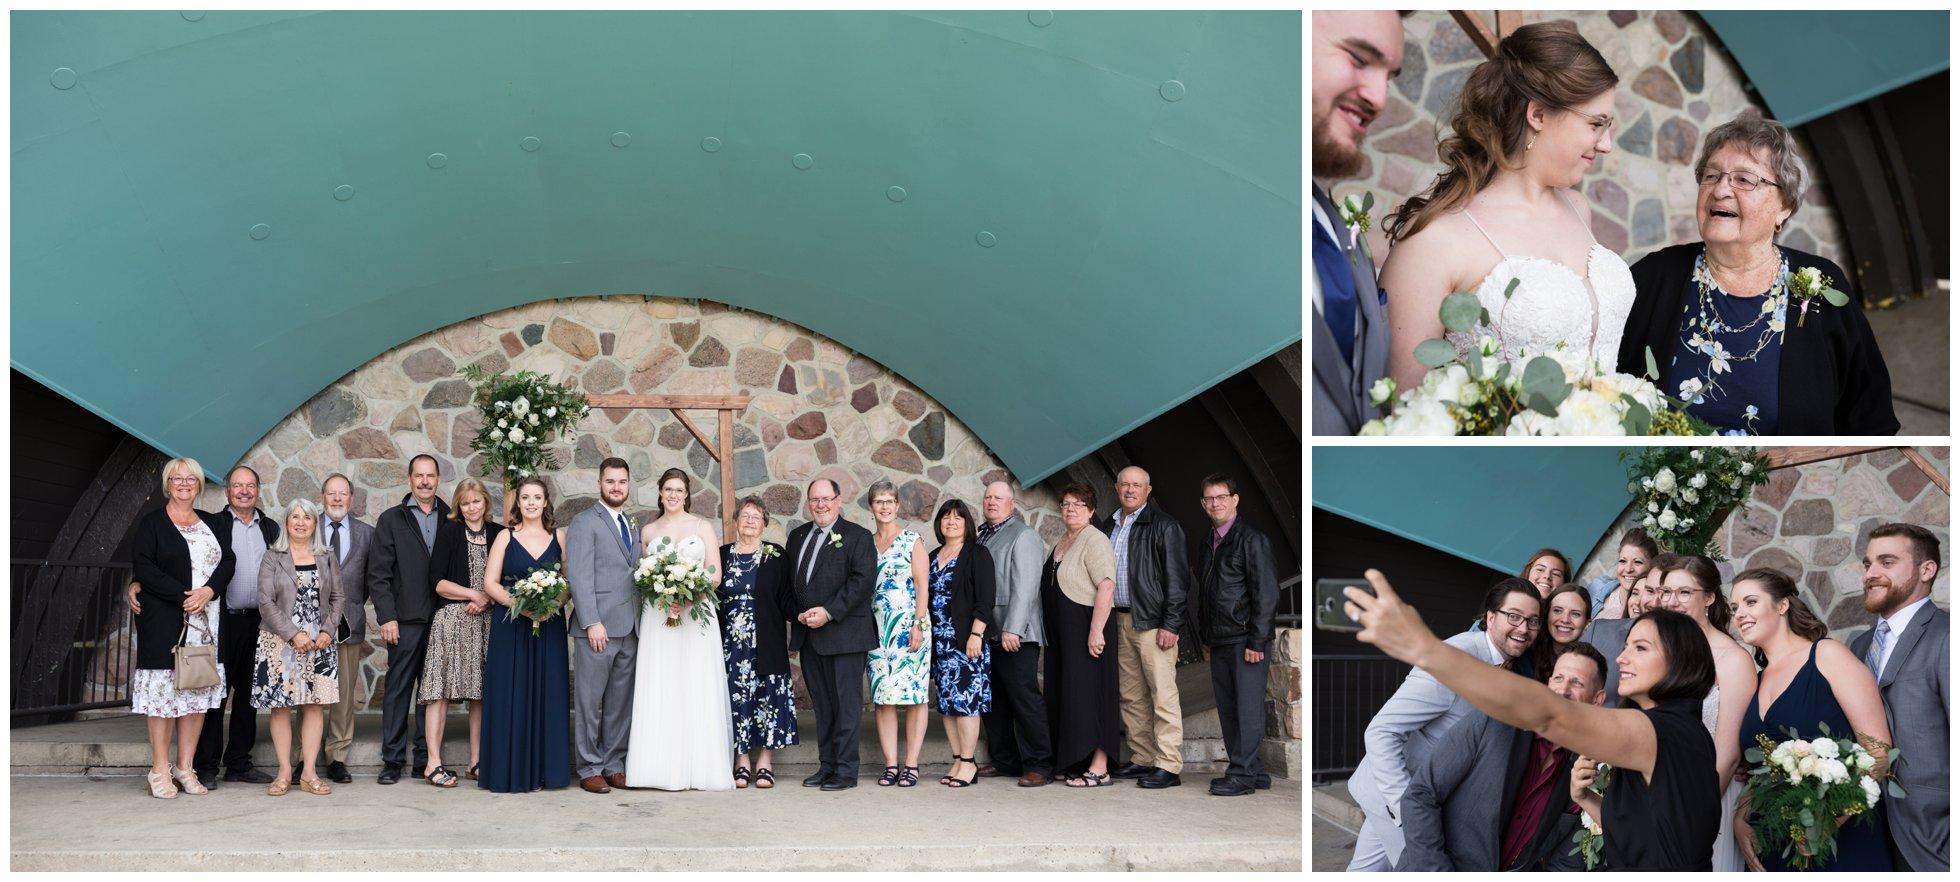 Emily and Royden Edmonton Wedding (Life by Selena Photography)_0020.jpg